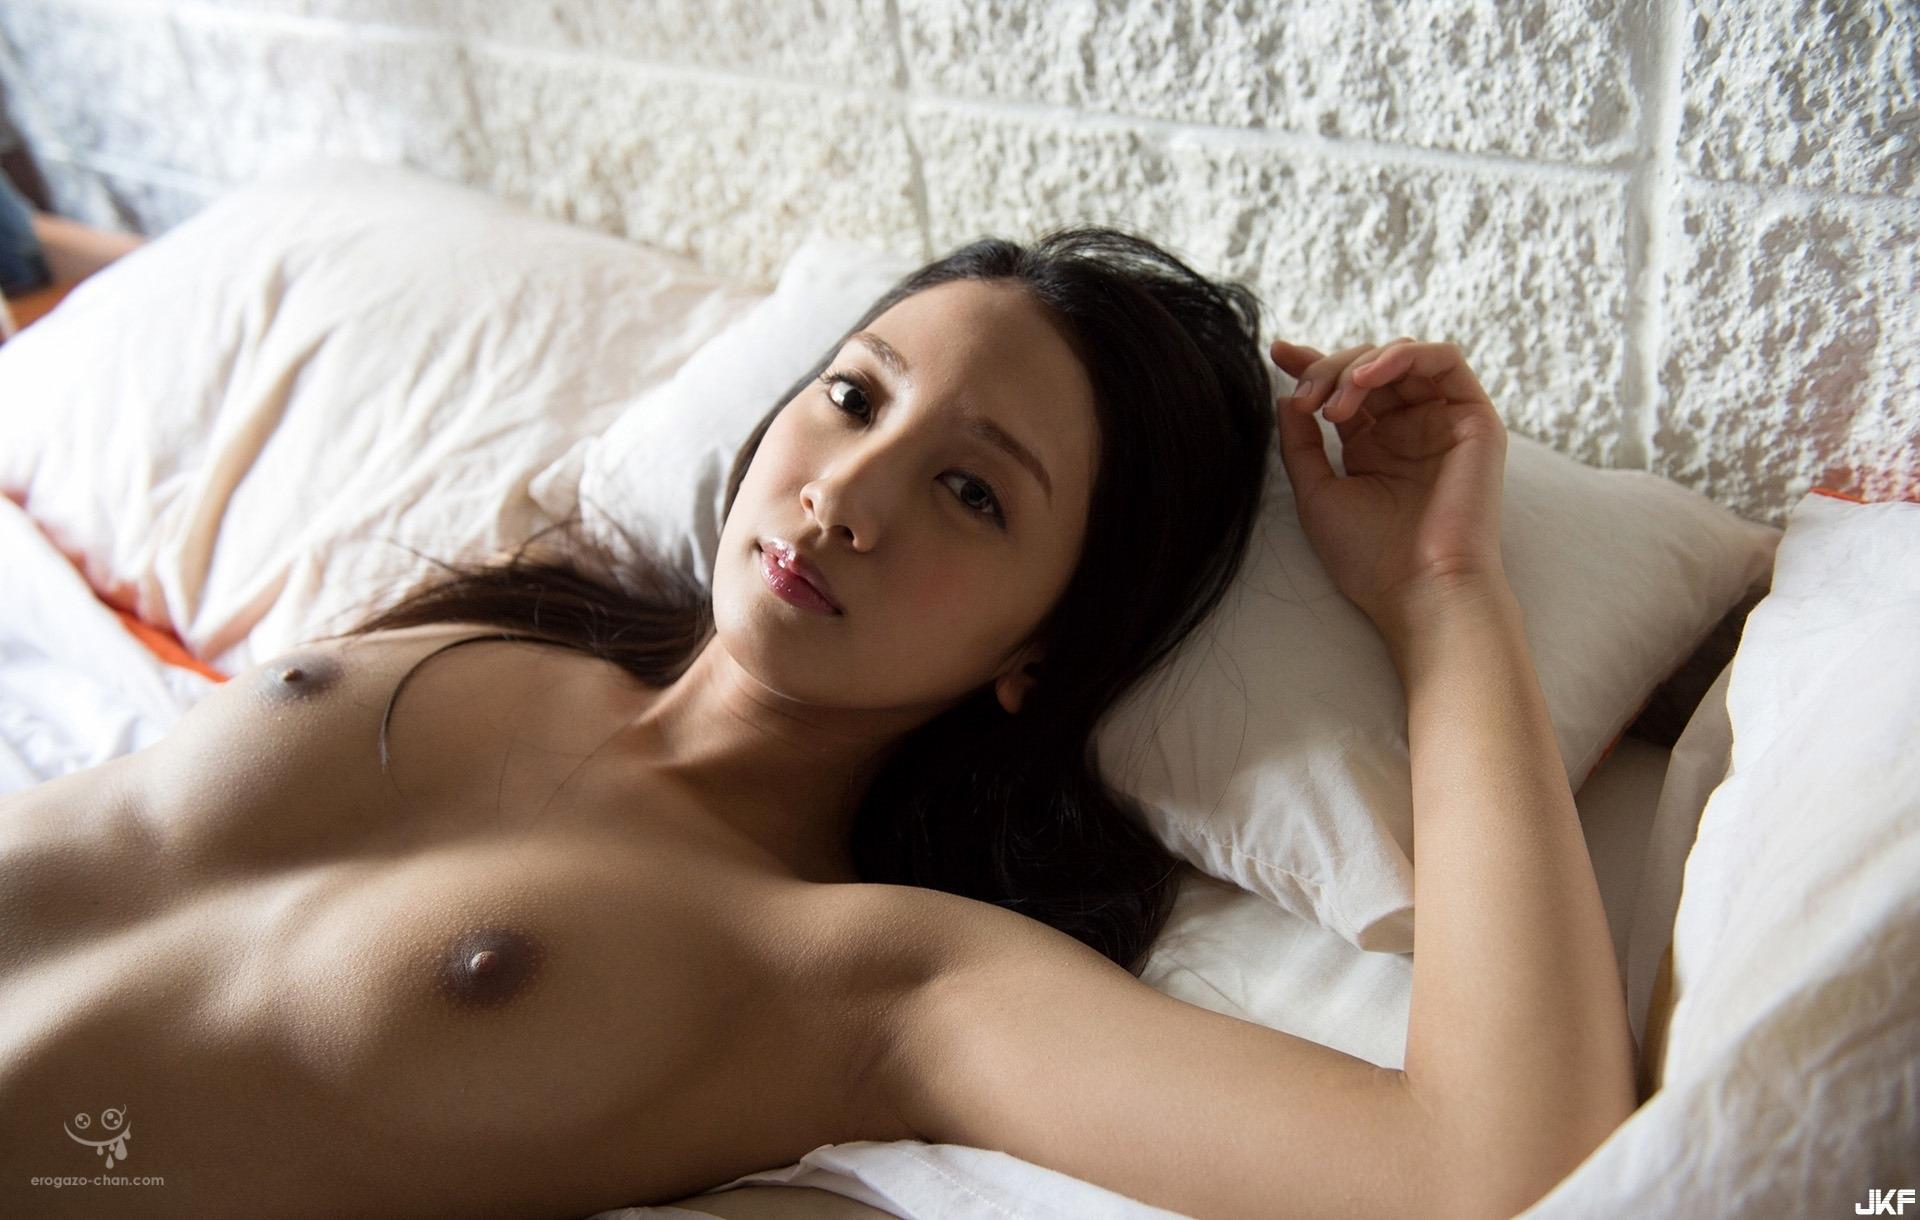 tsujimoto_an_1032-032.jpg